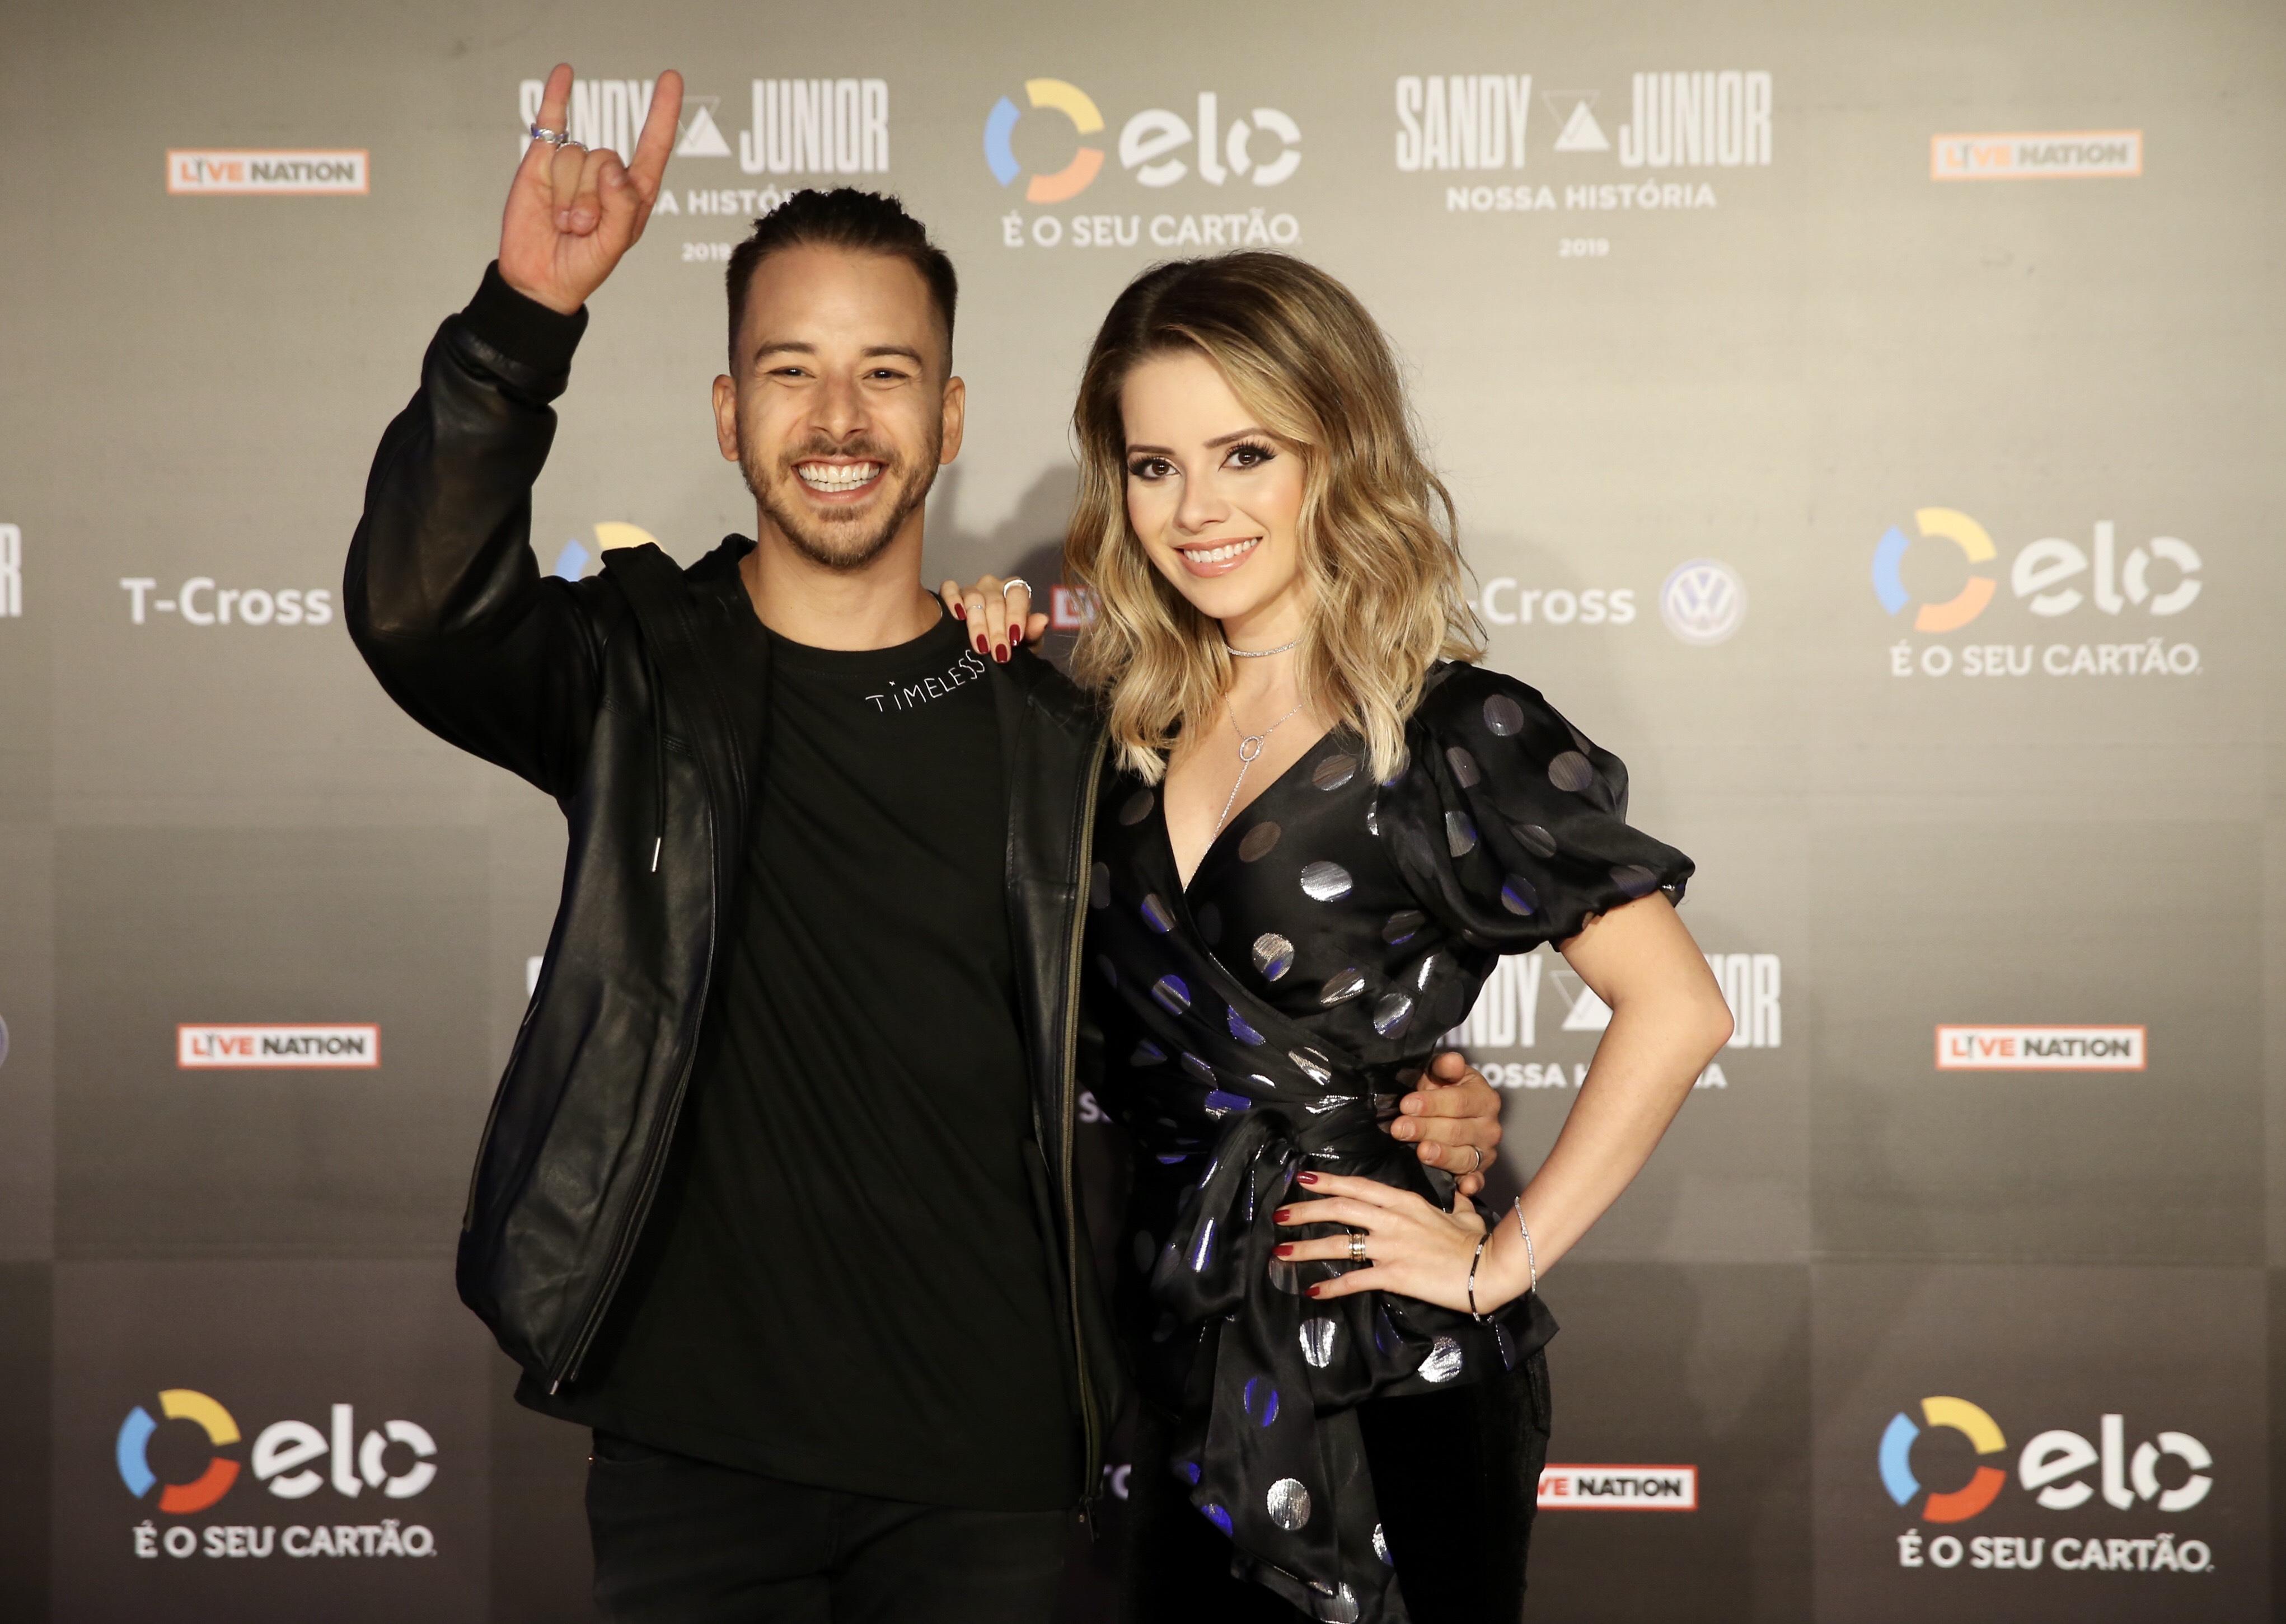 Turnê de Sandy & Junior passará por Brasília em julho